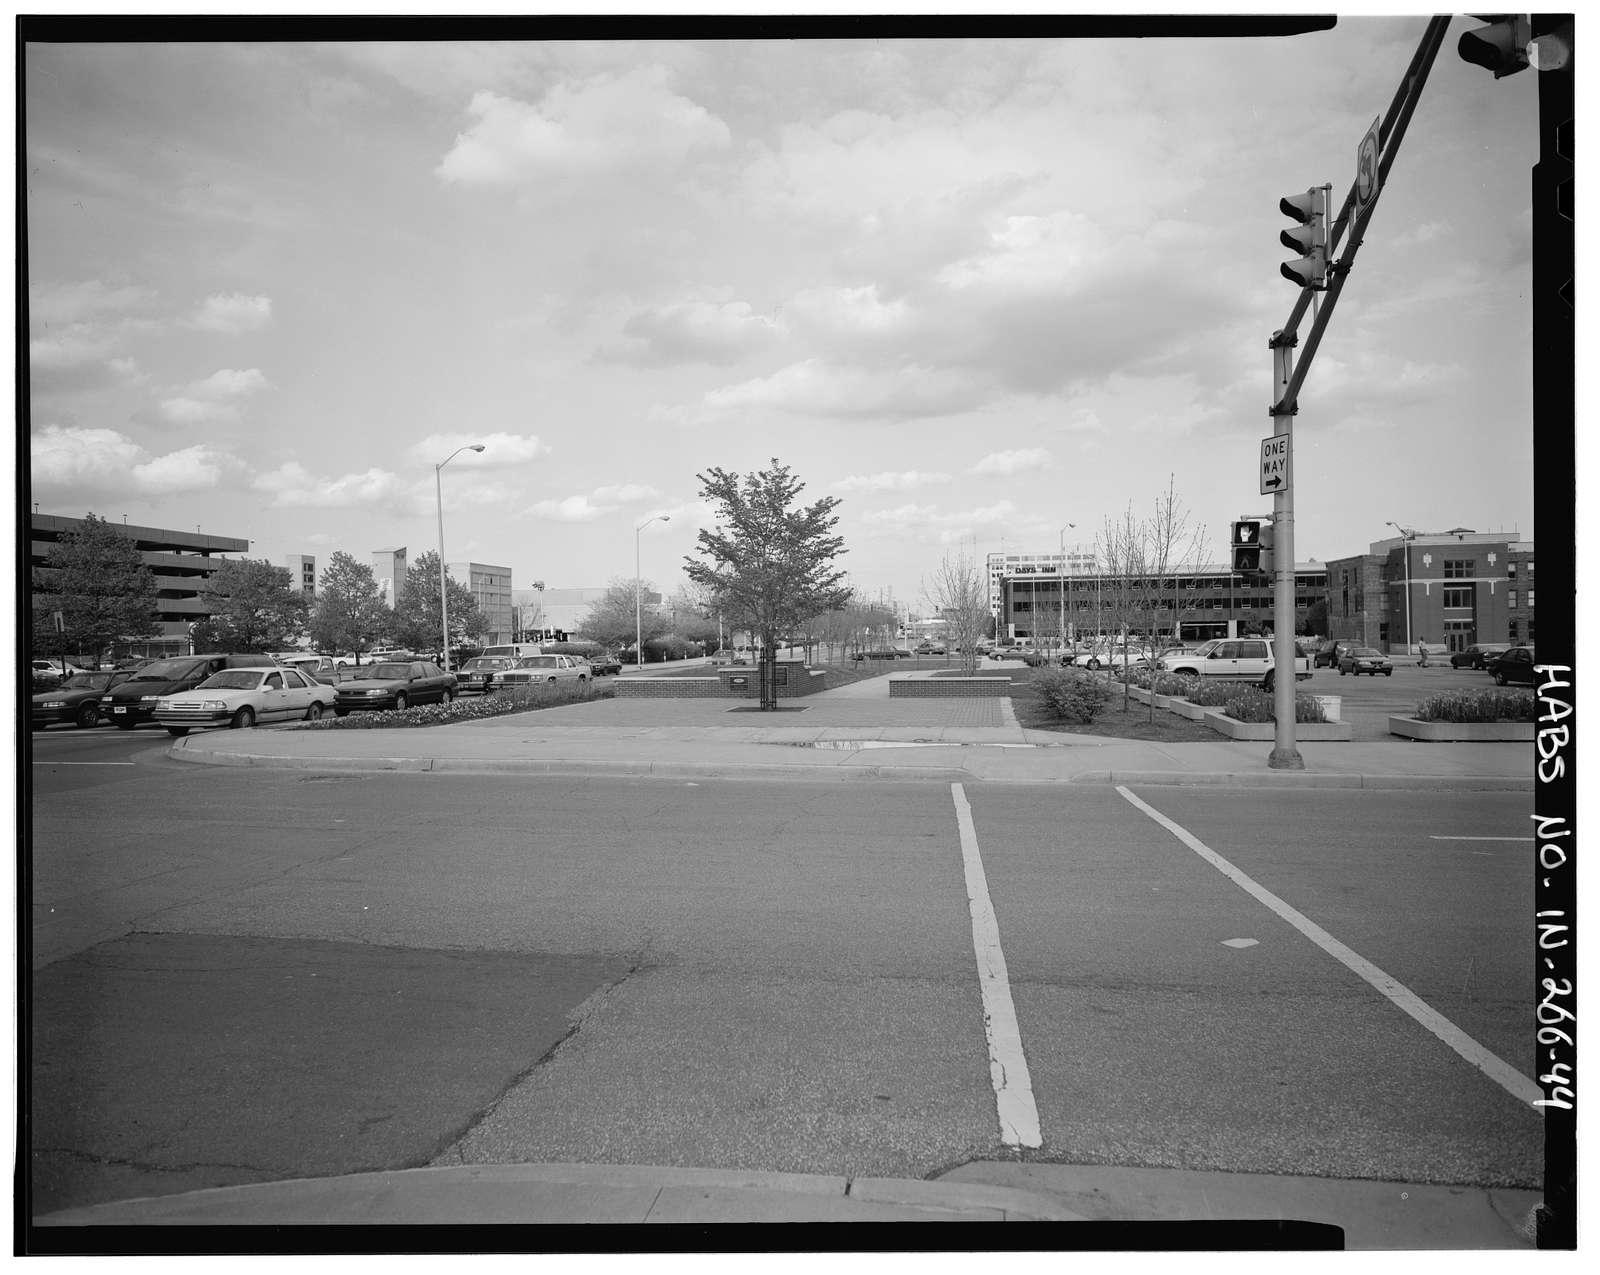 Washington Street Downtown Corridor, Washington Street between Alabama Street & Senate Avenue, Indianapolis, Marion County, IN